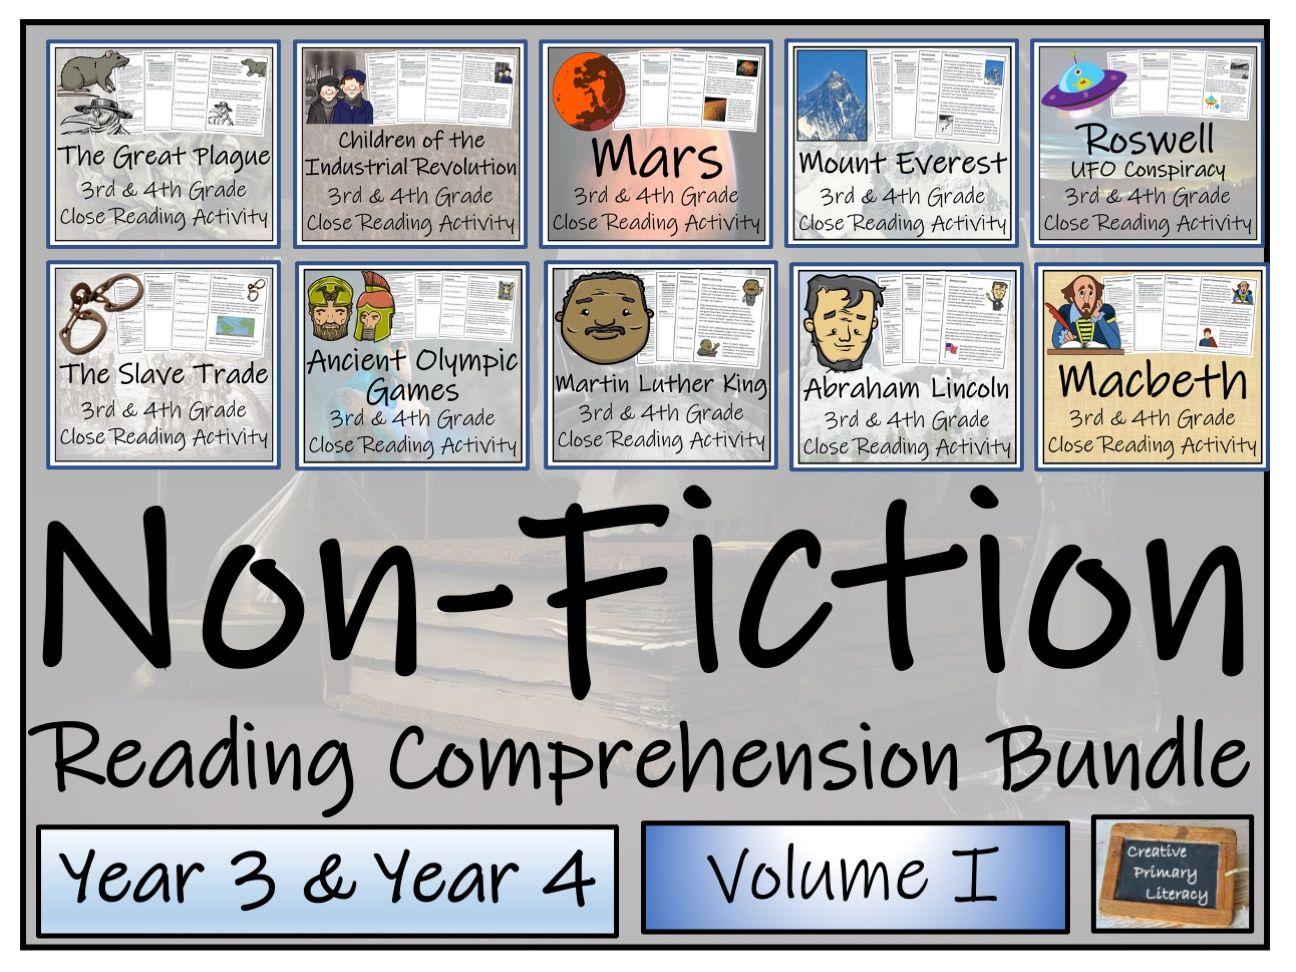 LKS2 Non-Fiction Volume I Reading Comprehension Activity Bundle